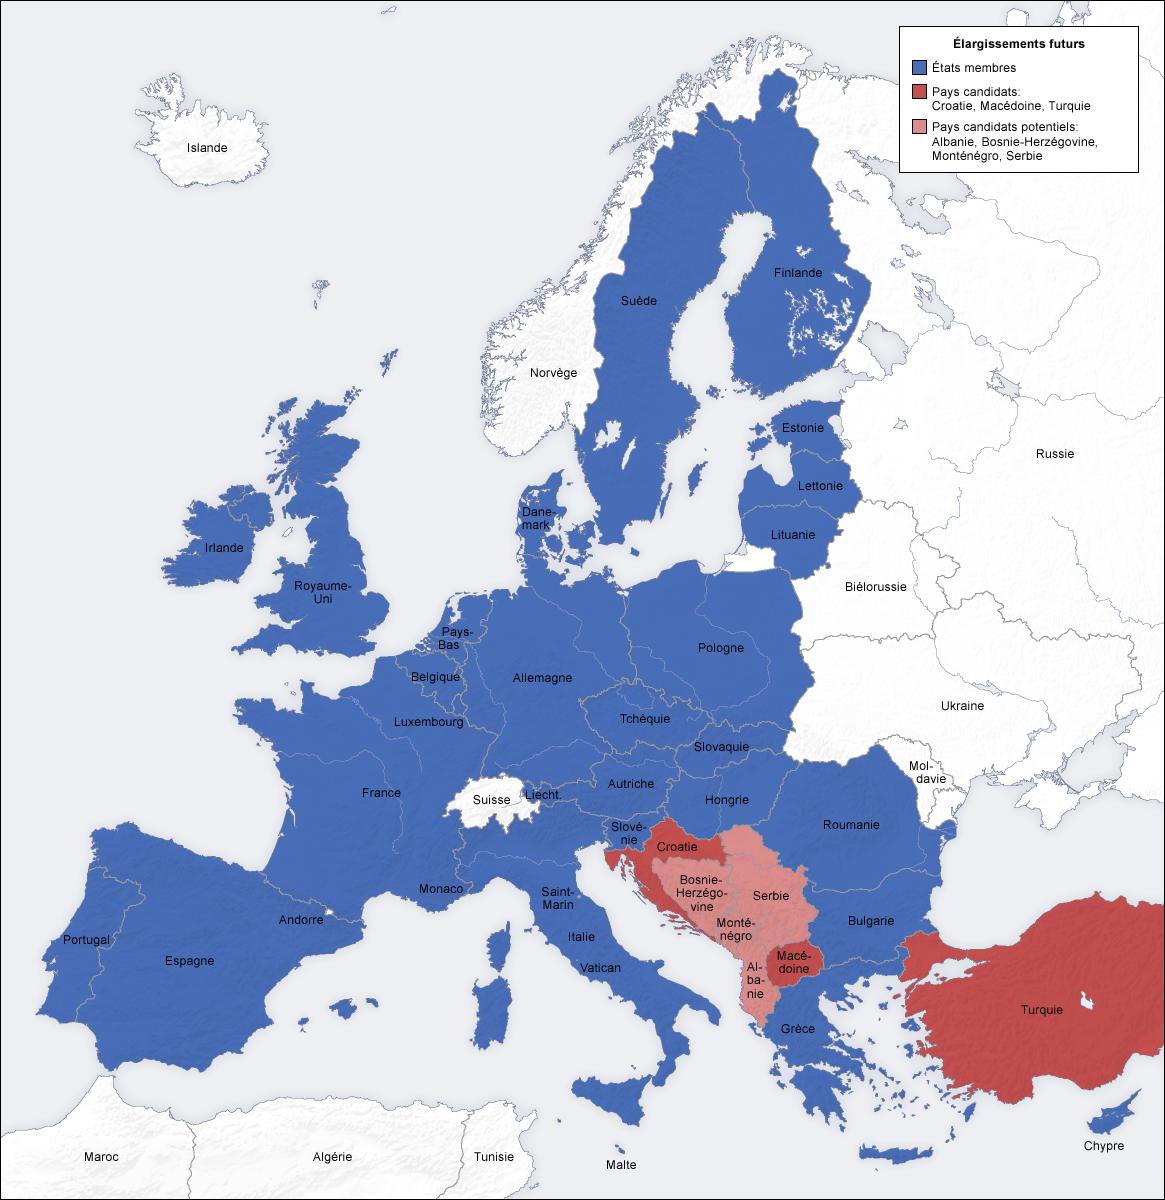 European_union_future_enlargements_map_fr